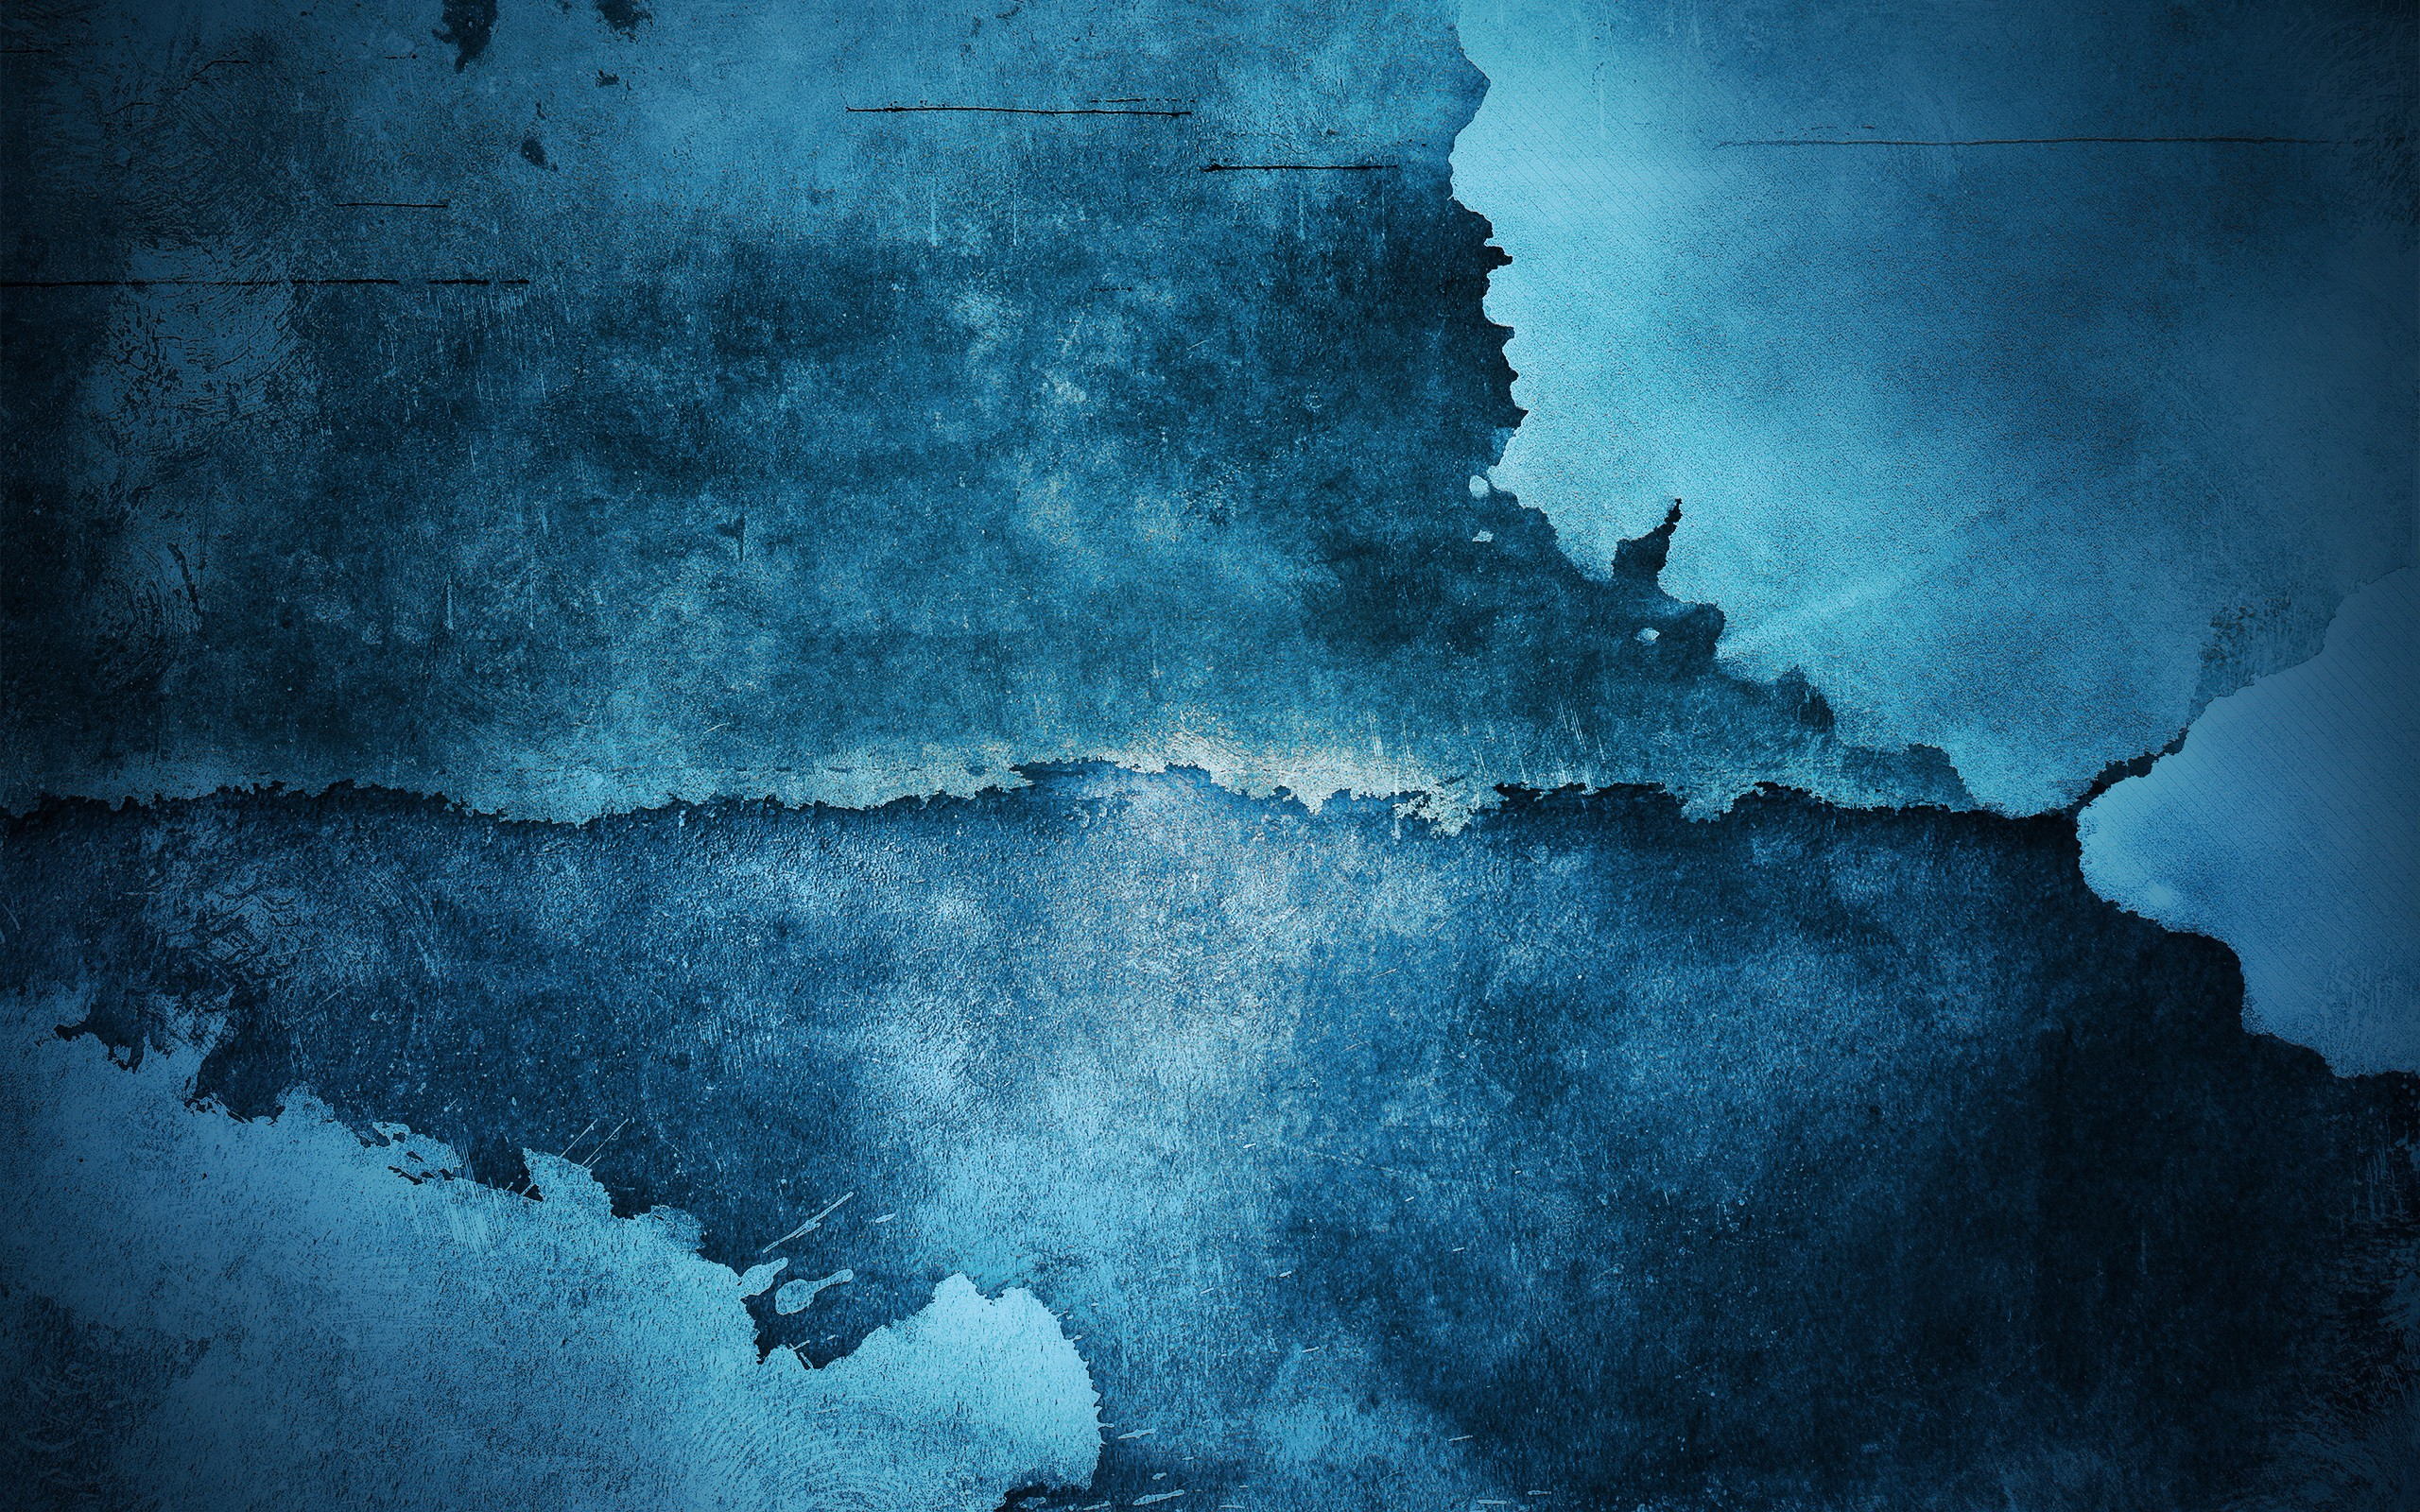 Download Blue Grunge Wallpaper 2560x1600 Wallpoper 390661 2560x1600